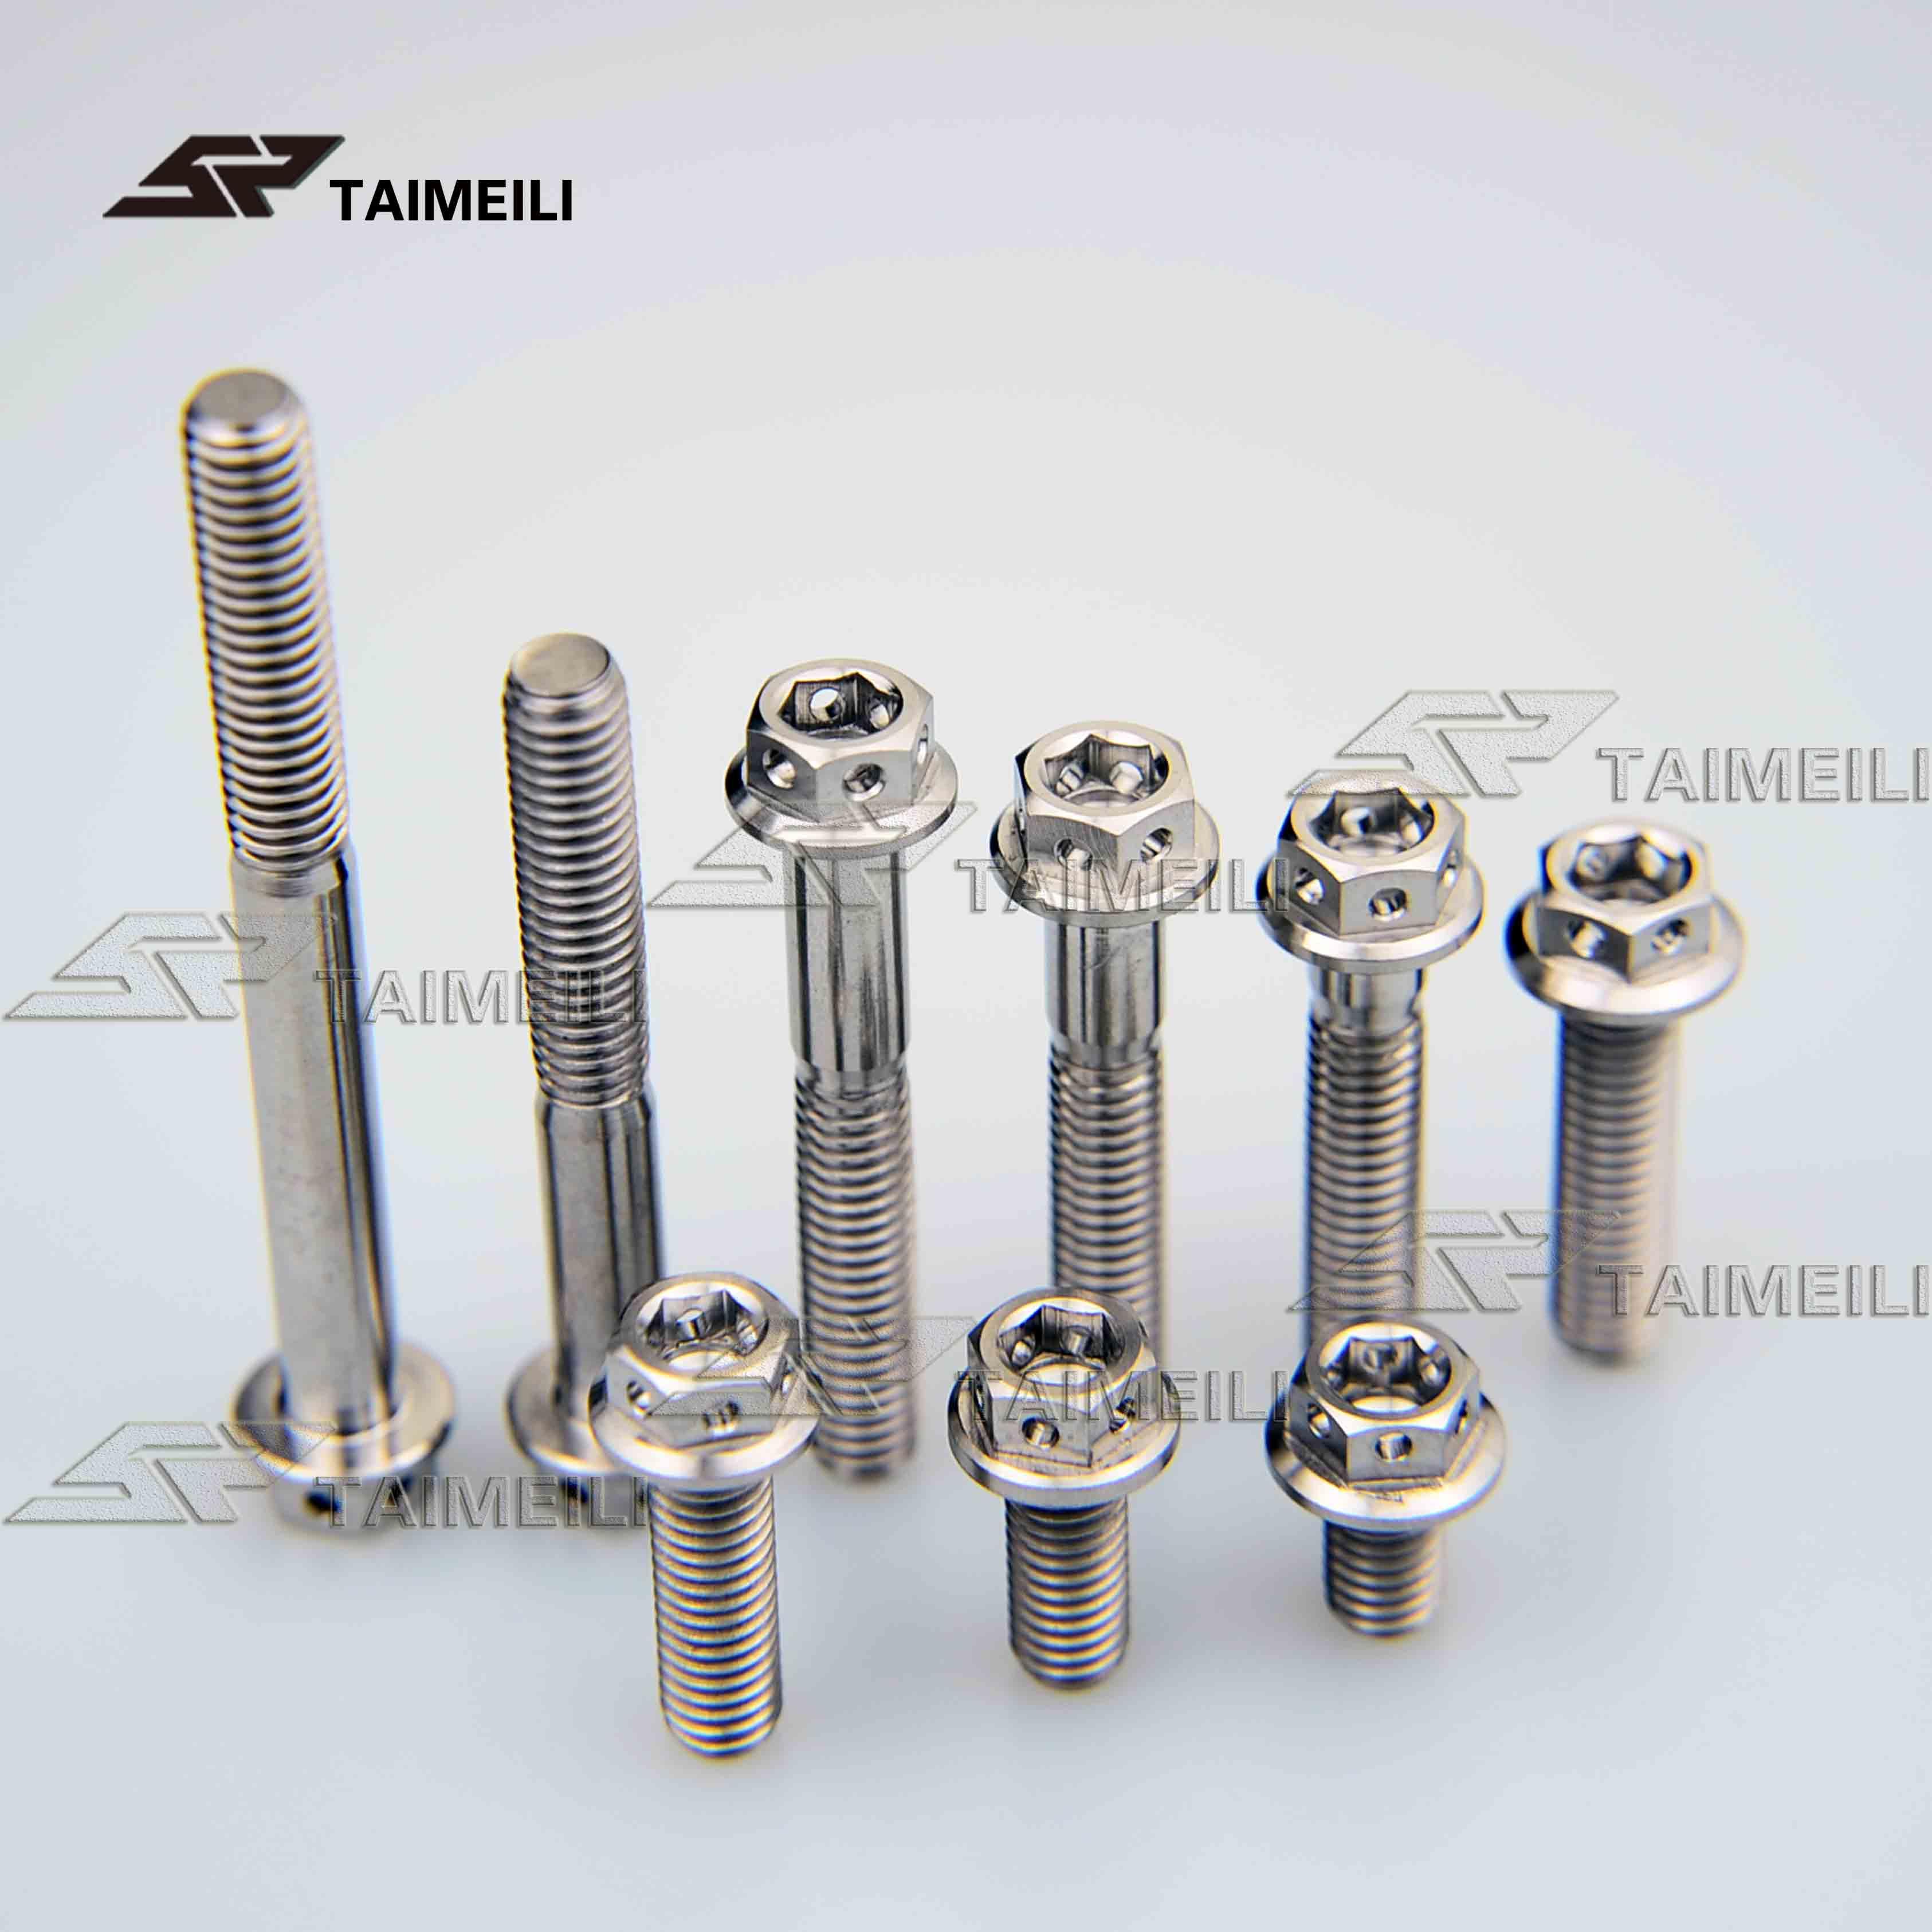 Tornillo de brida de aleación de titanio TAIMAILI plata hexagonal interior y exterior M6x/10/15/20/25/ tornillo de reparación de motocicleta de 30/35/45/50/60mm